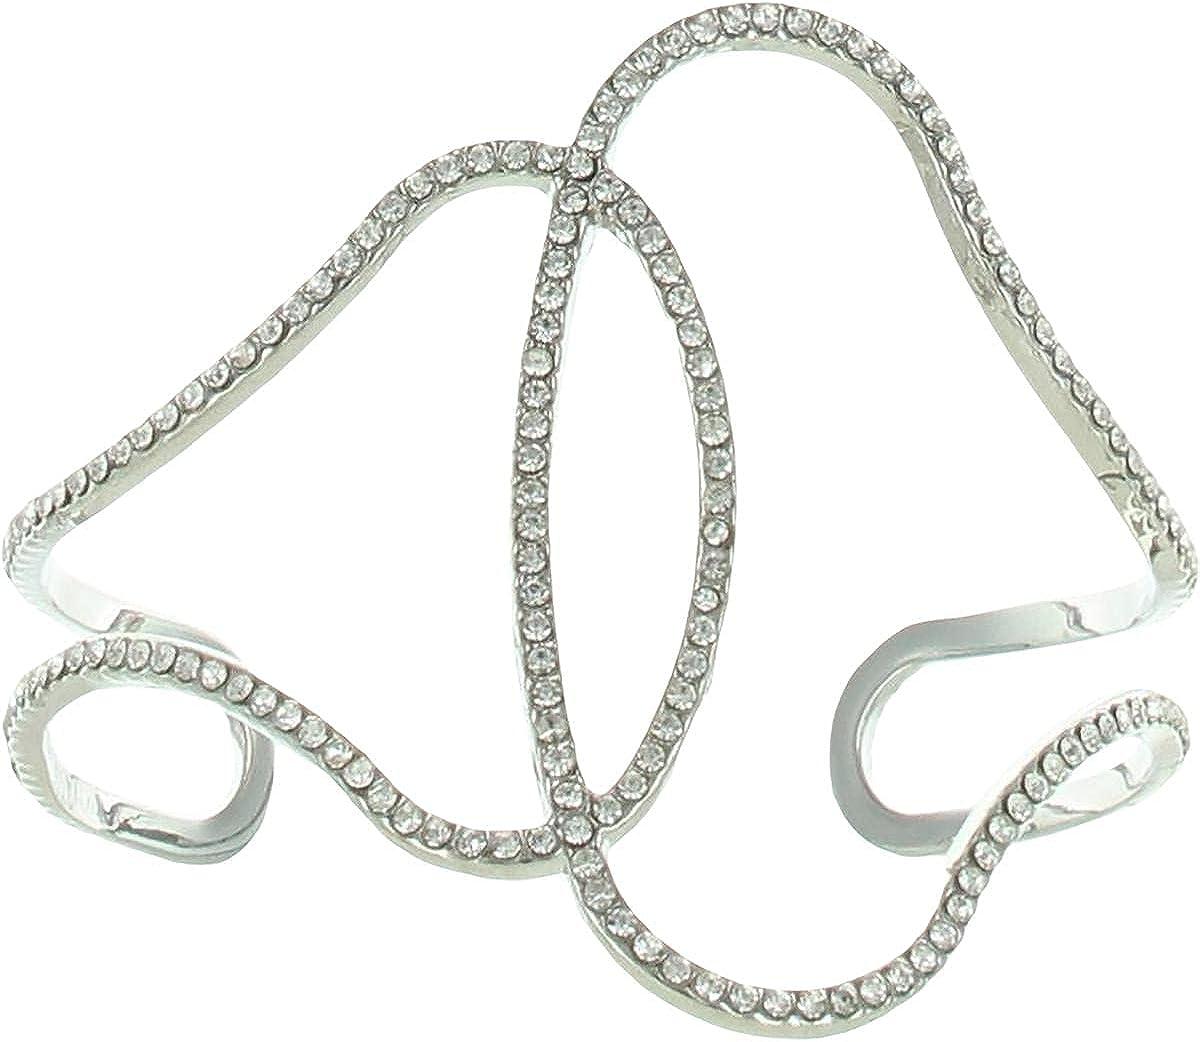 BCBGMAXAZRIA store 25% OFF Womens Imtnrhodim Cubic Zirconia Cuff Twisted Brace